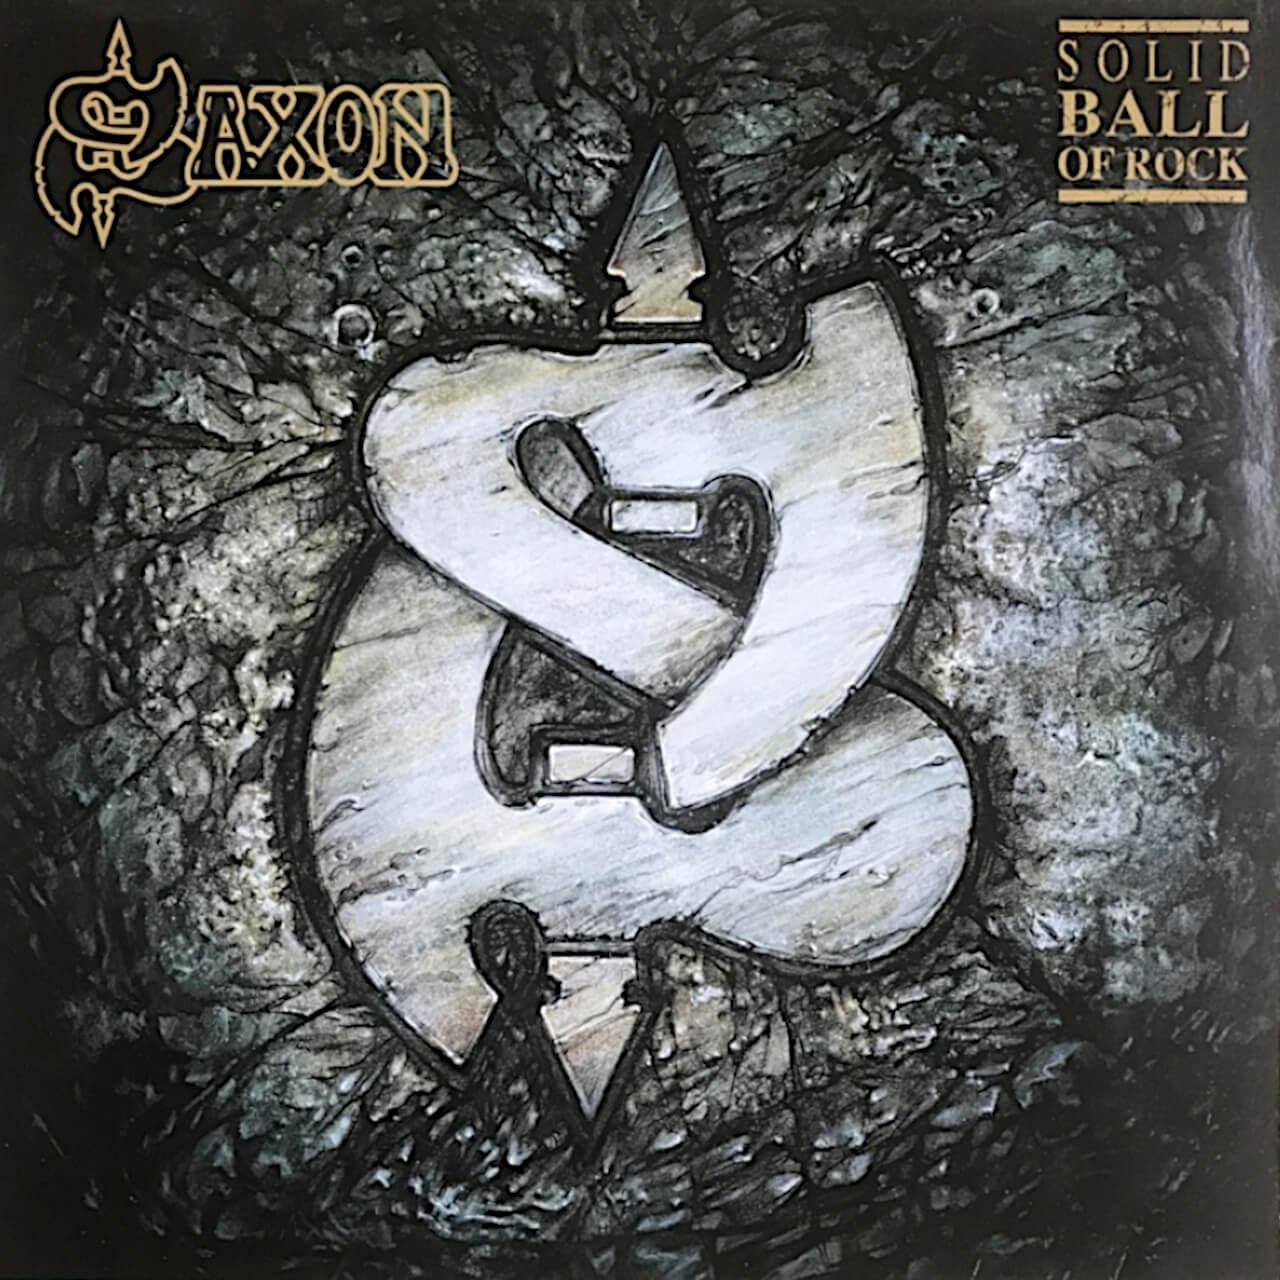 Saxon Ball de rock sòlid